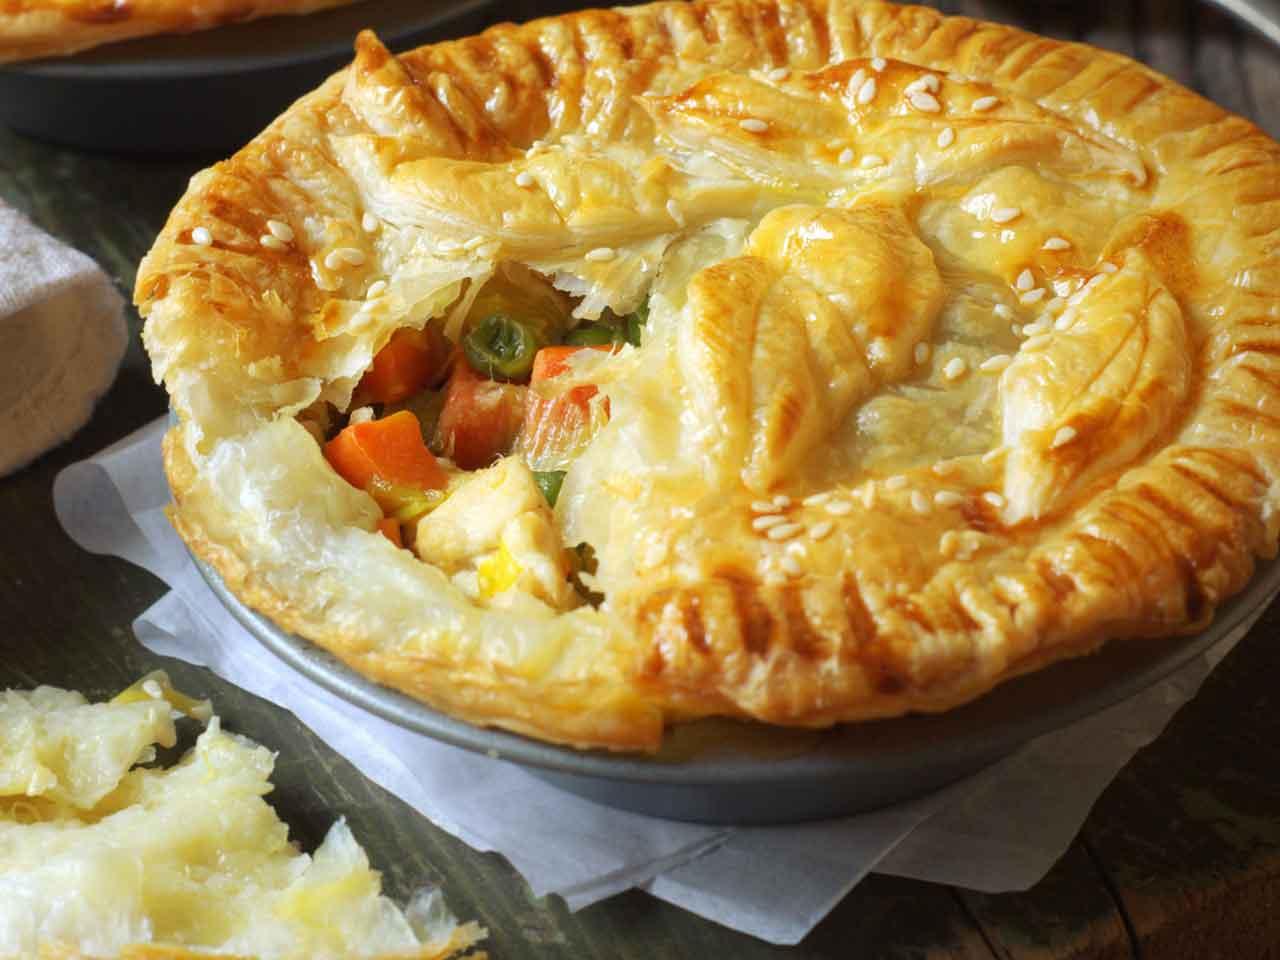 Woolton pie - Saga